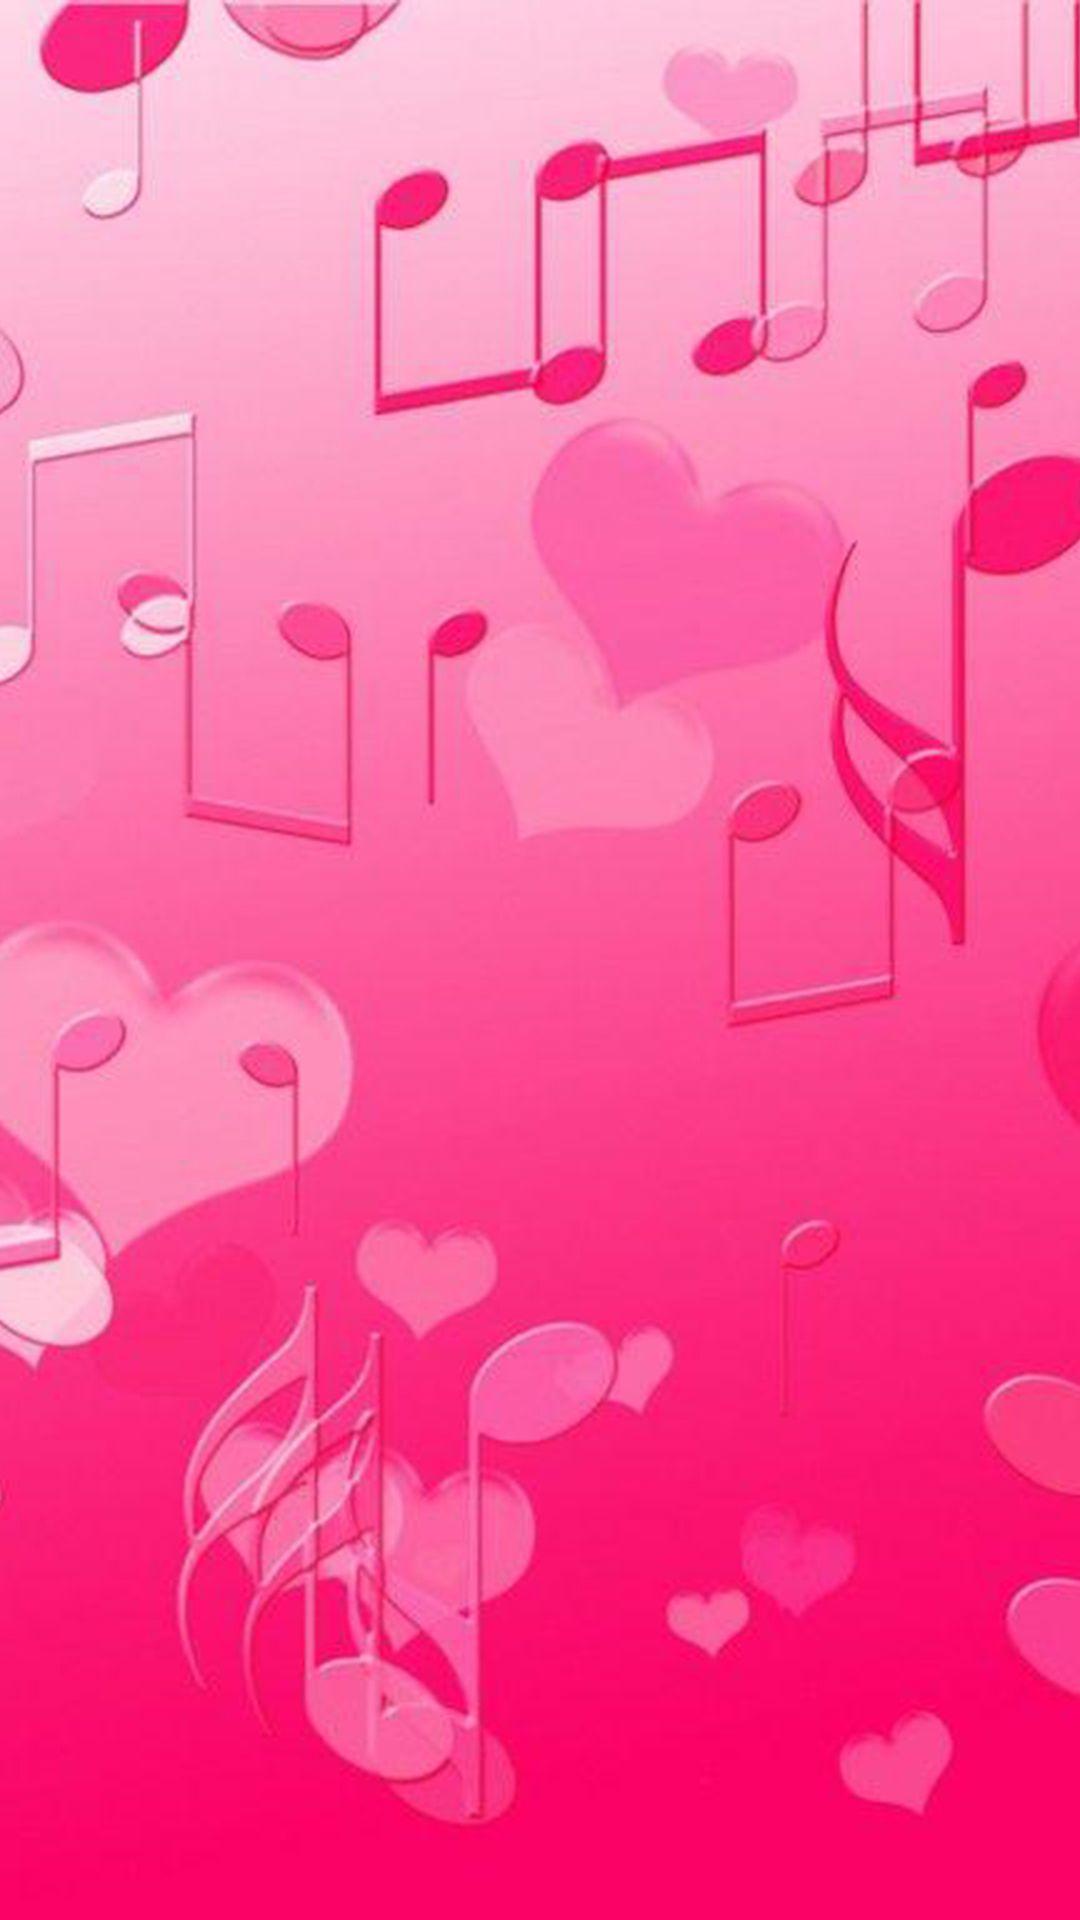 Wonderful Wallpaper Music Iphone 4s - 200f11694a2989090e8d372177d4a7c3  You Should Have_455482.jpg